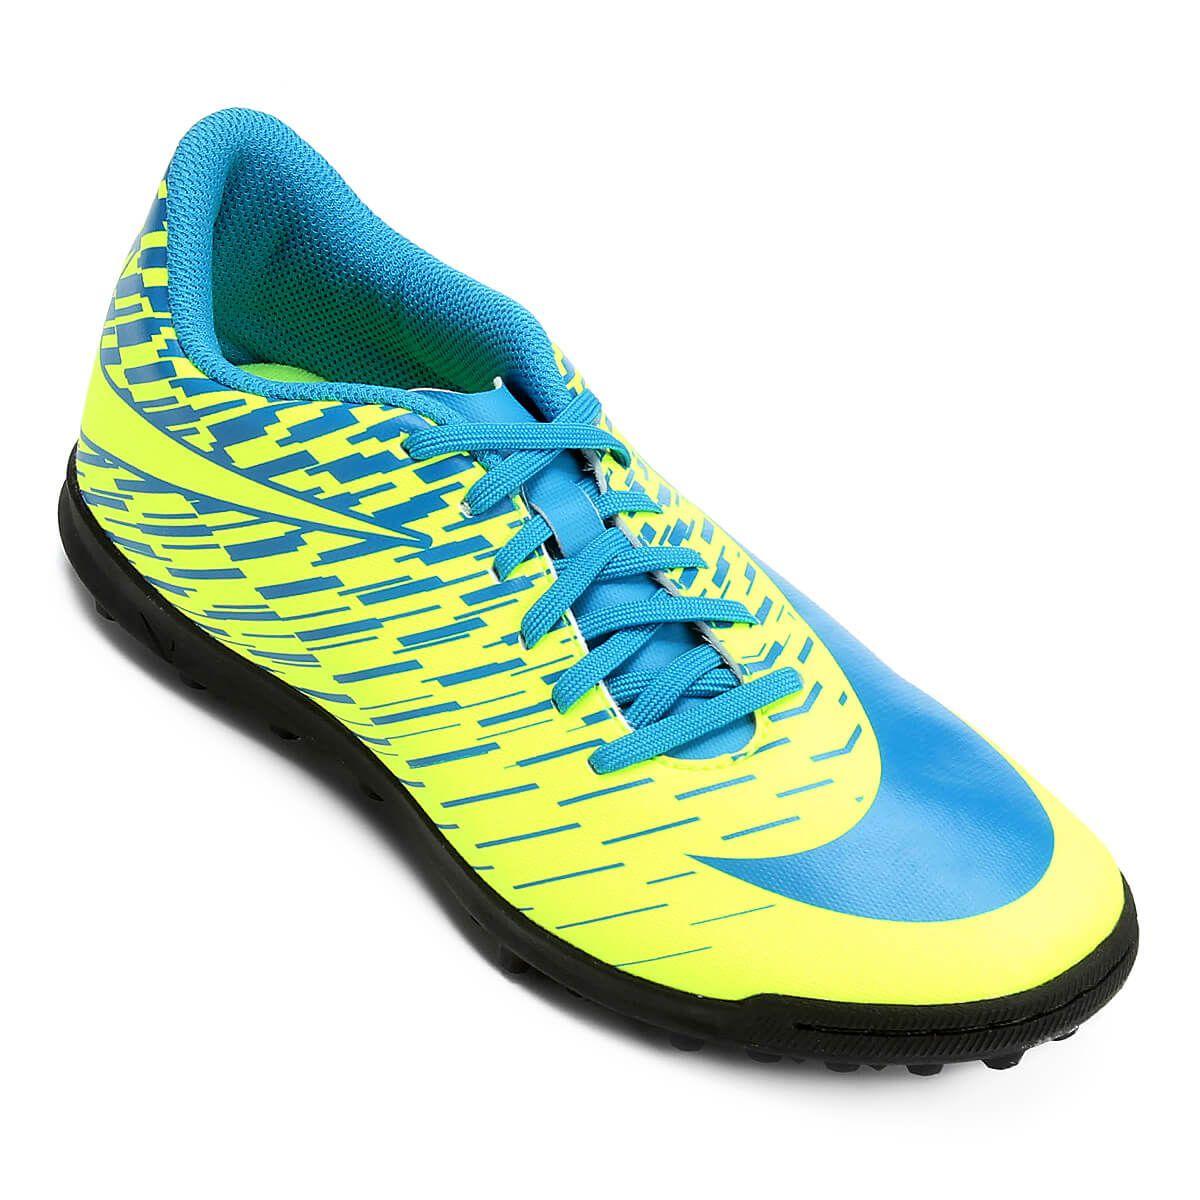 22a4498549 Chuteira Society Nike Bravata Ii Tf - BRACIA SHOP  Loja de Roupas ...